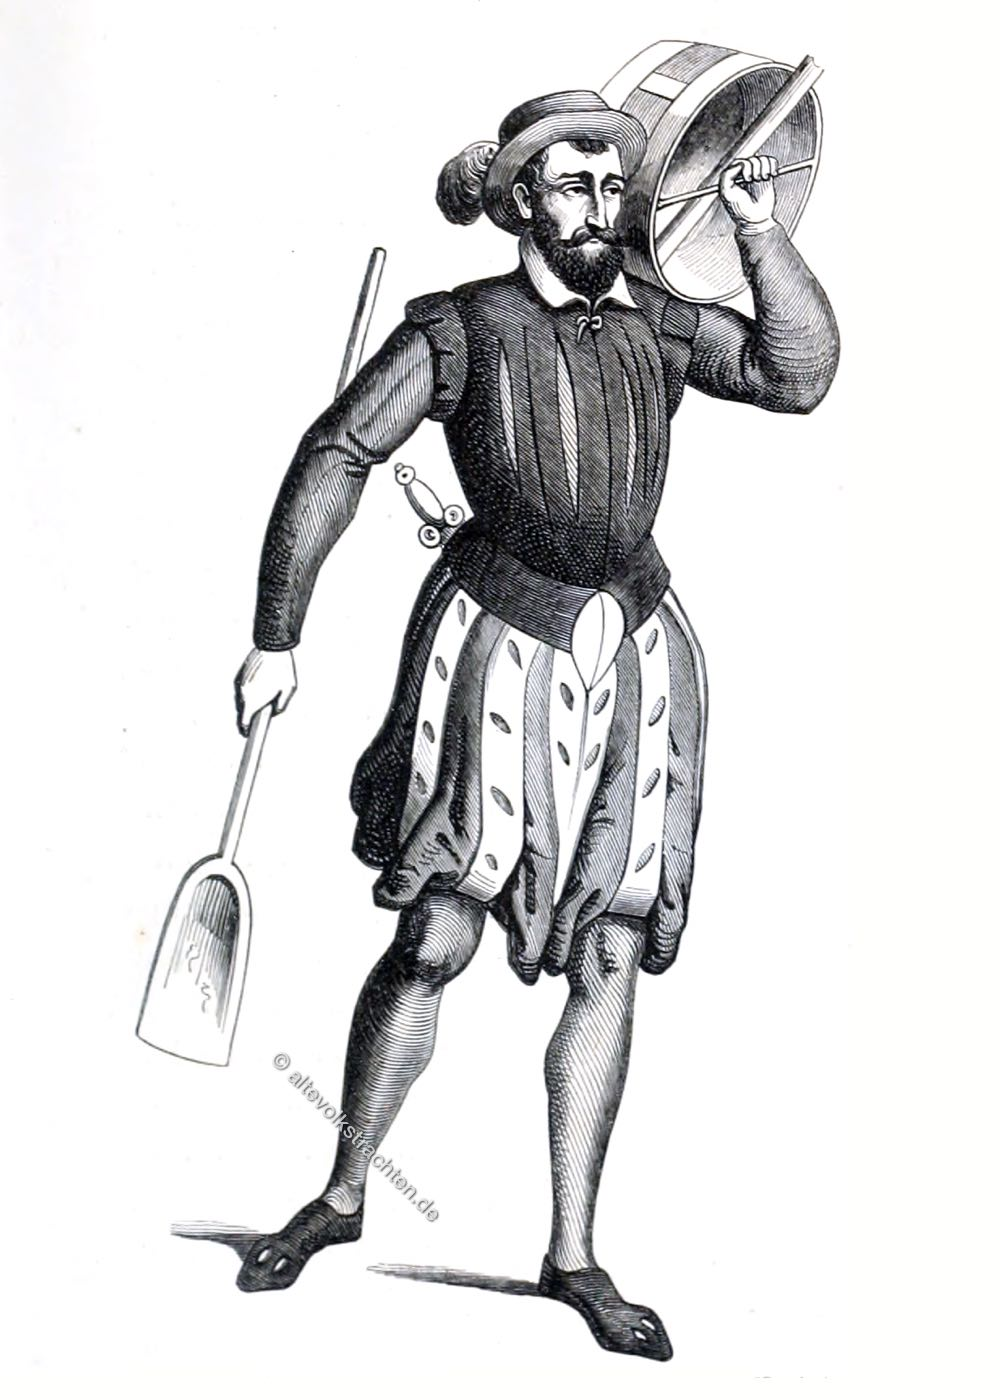 Getreidemesser, Parade, Kostüm, Mittelalter, Holland, Niederlande, Paradekostüm, Gent, 16. Jahrhundert,